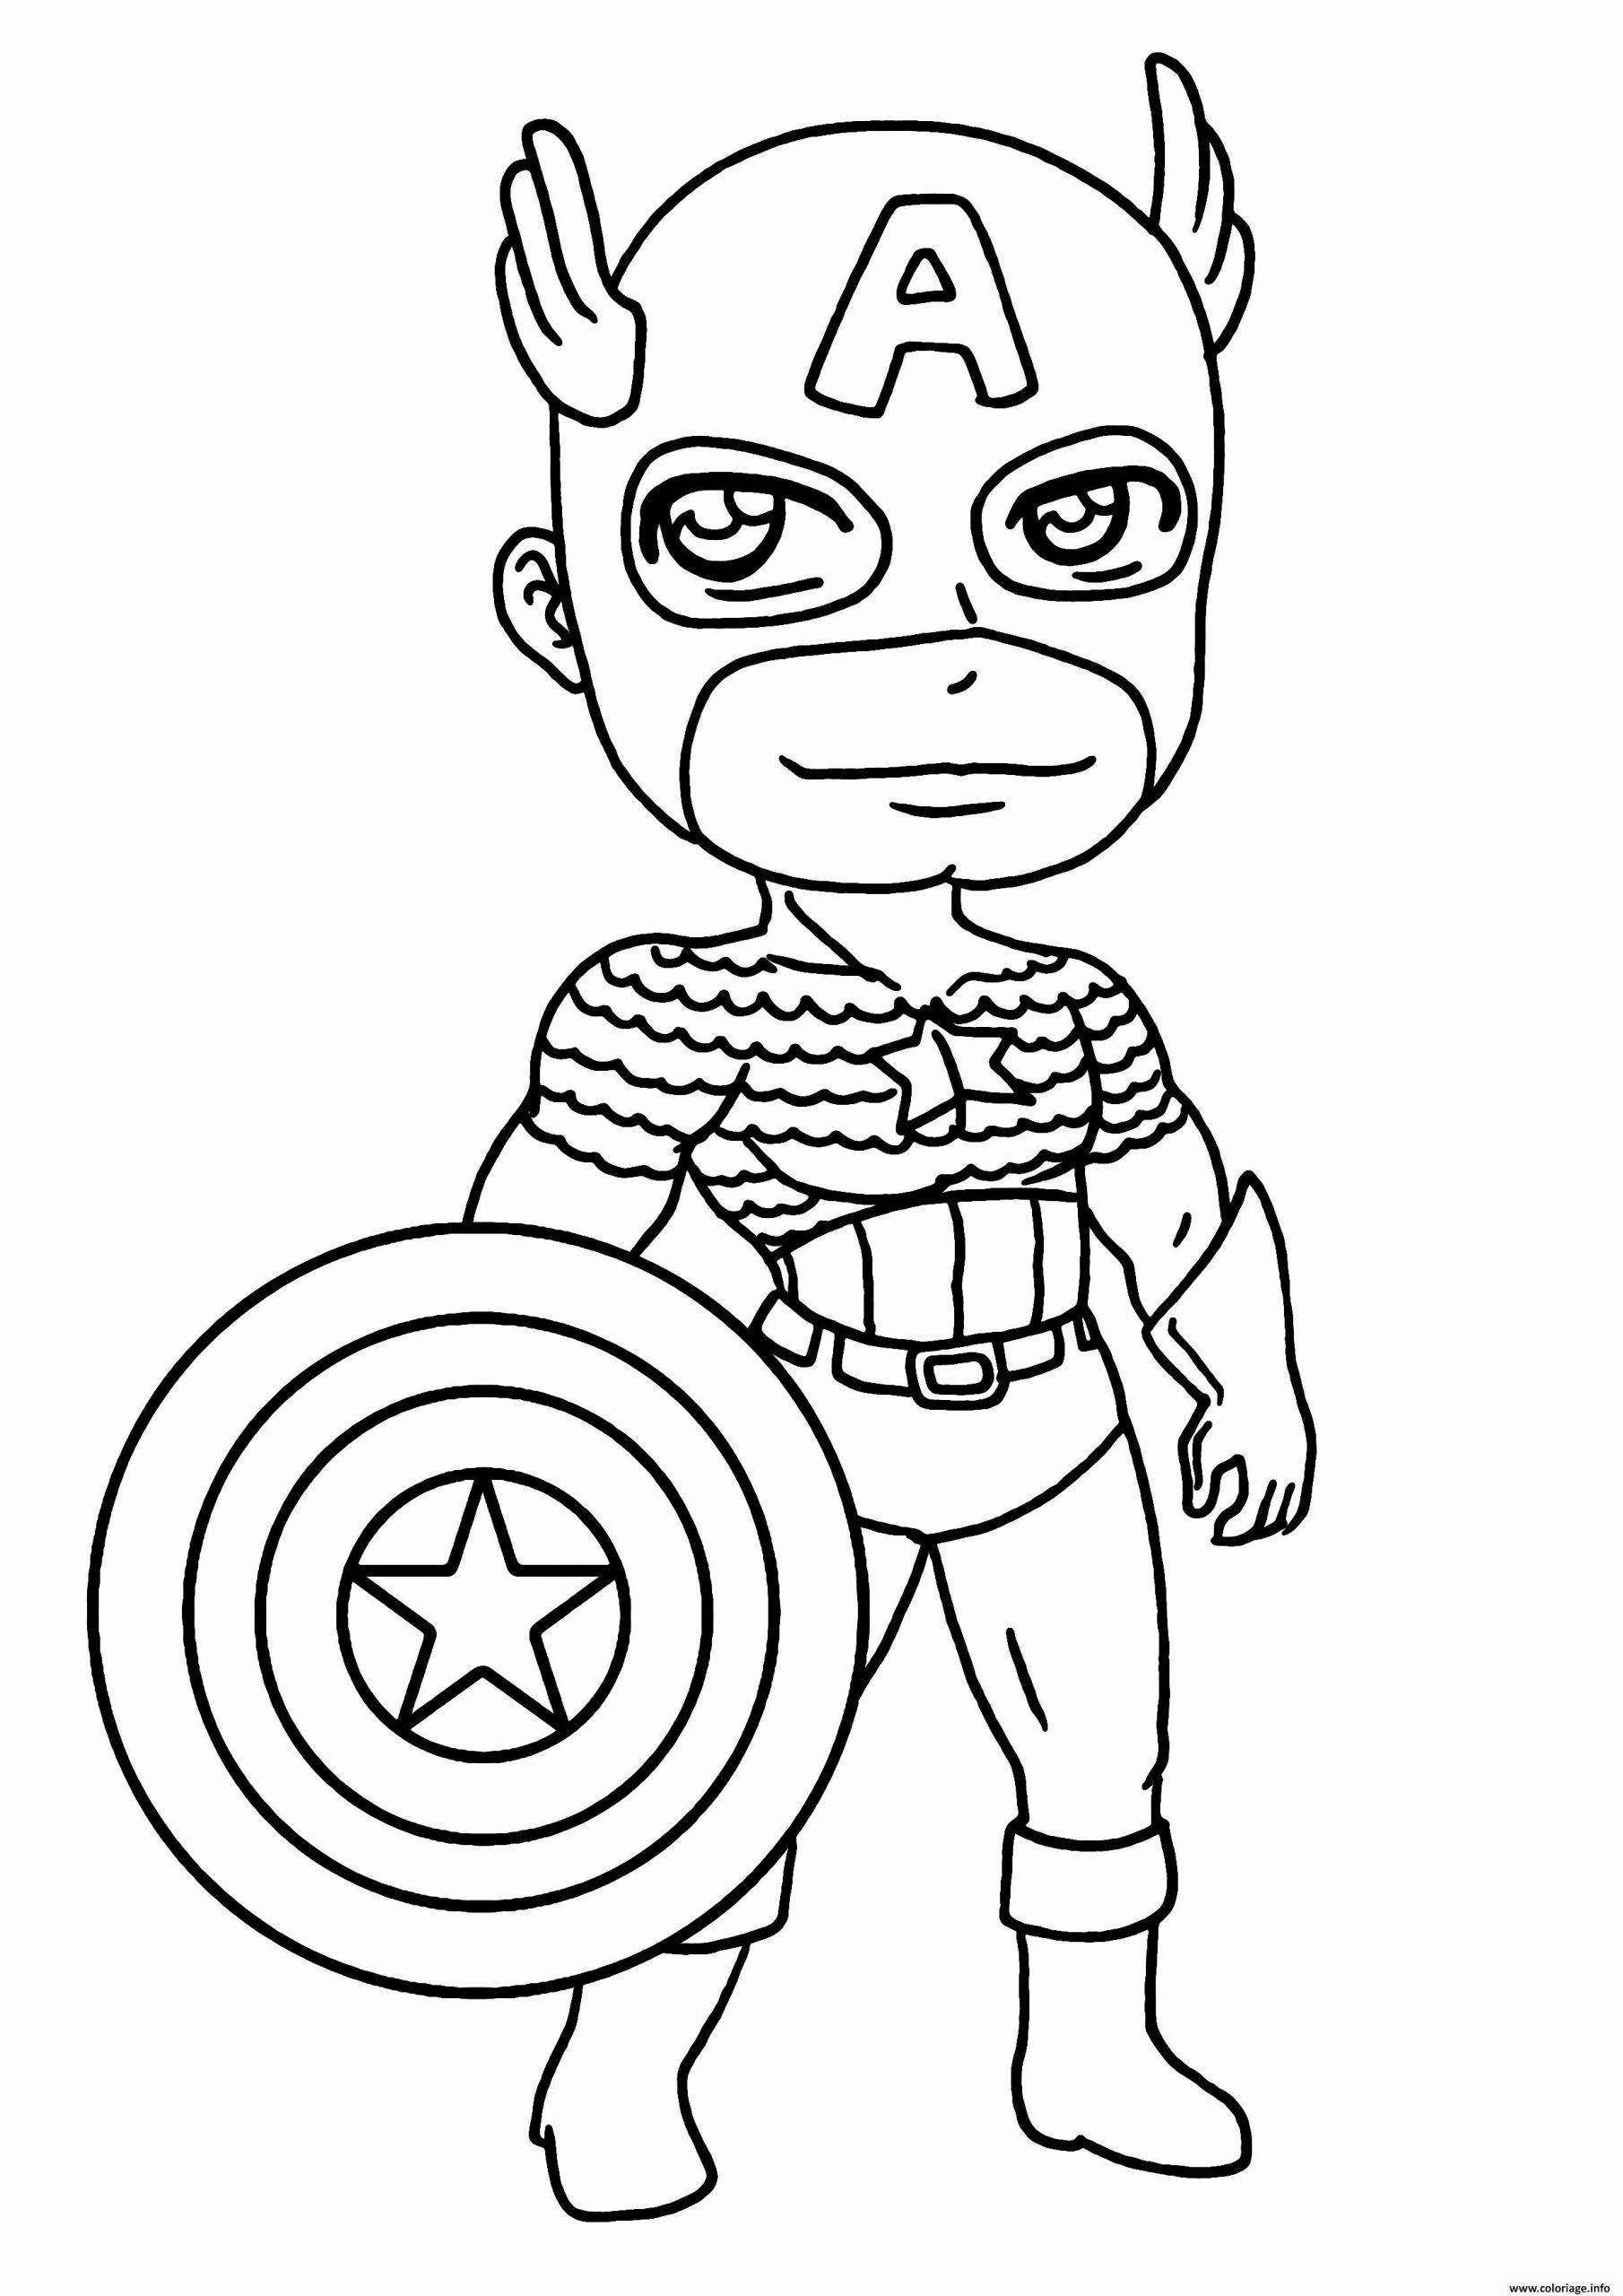 Coloriage Garcon Super Heros Capitaine America Dessin serapportantà Coloriage À Imprimer Garçon